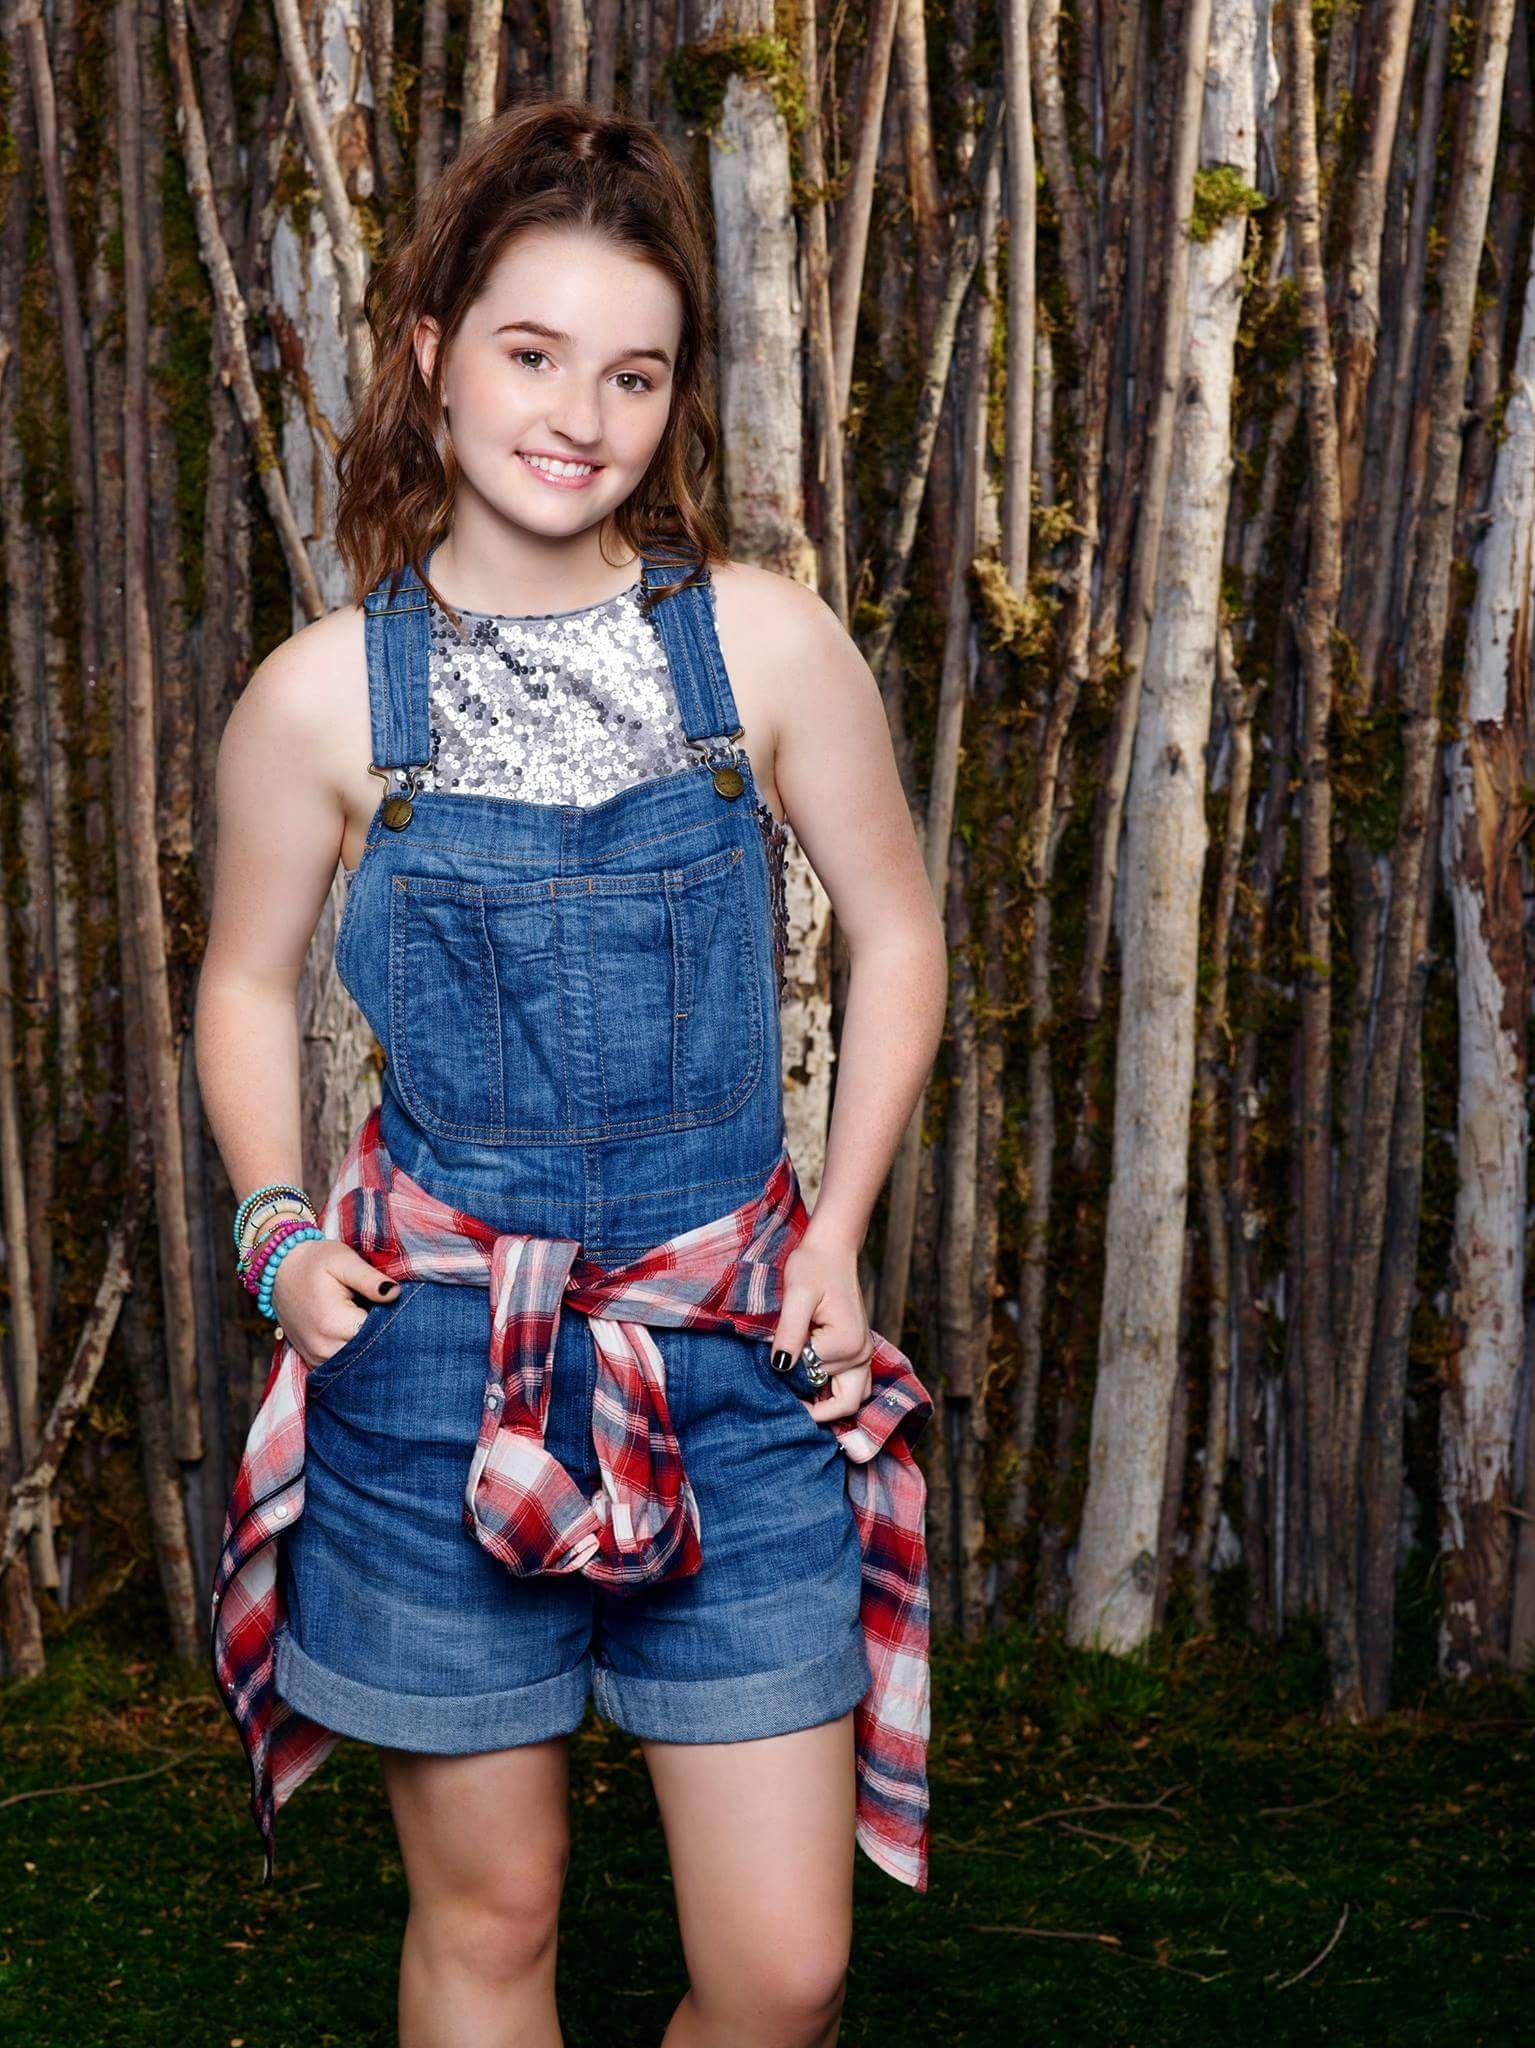 Teen girl overalls